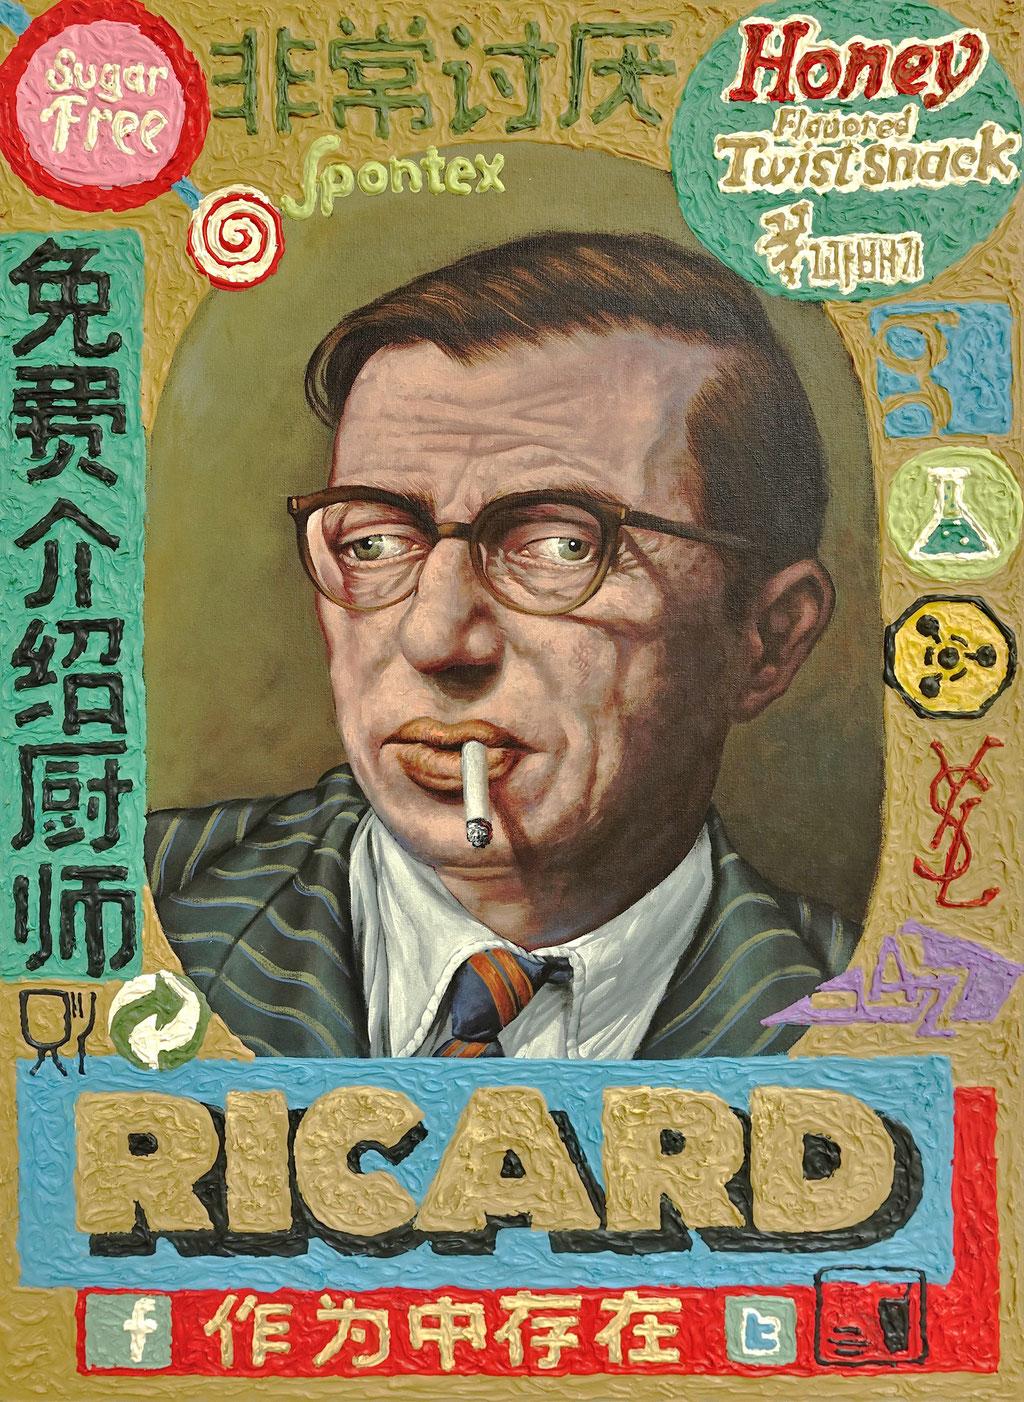 Objekt / Gemälde 540, Ricard , Acryl auf Hartfaserobjekt, 2016, 50 x 70 x 10 cm